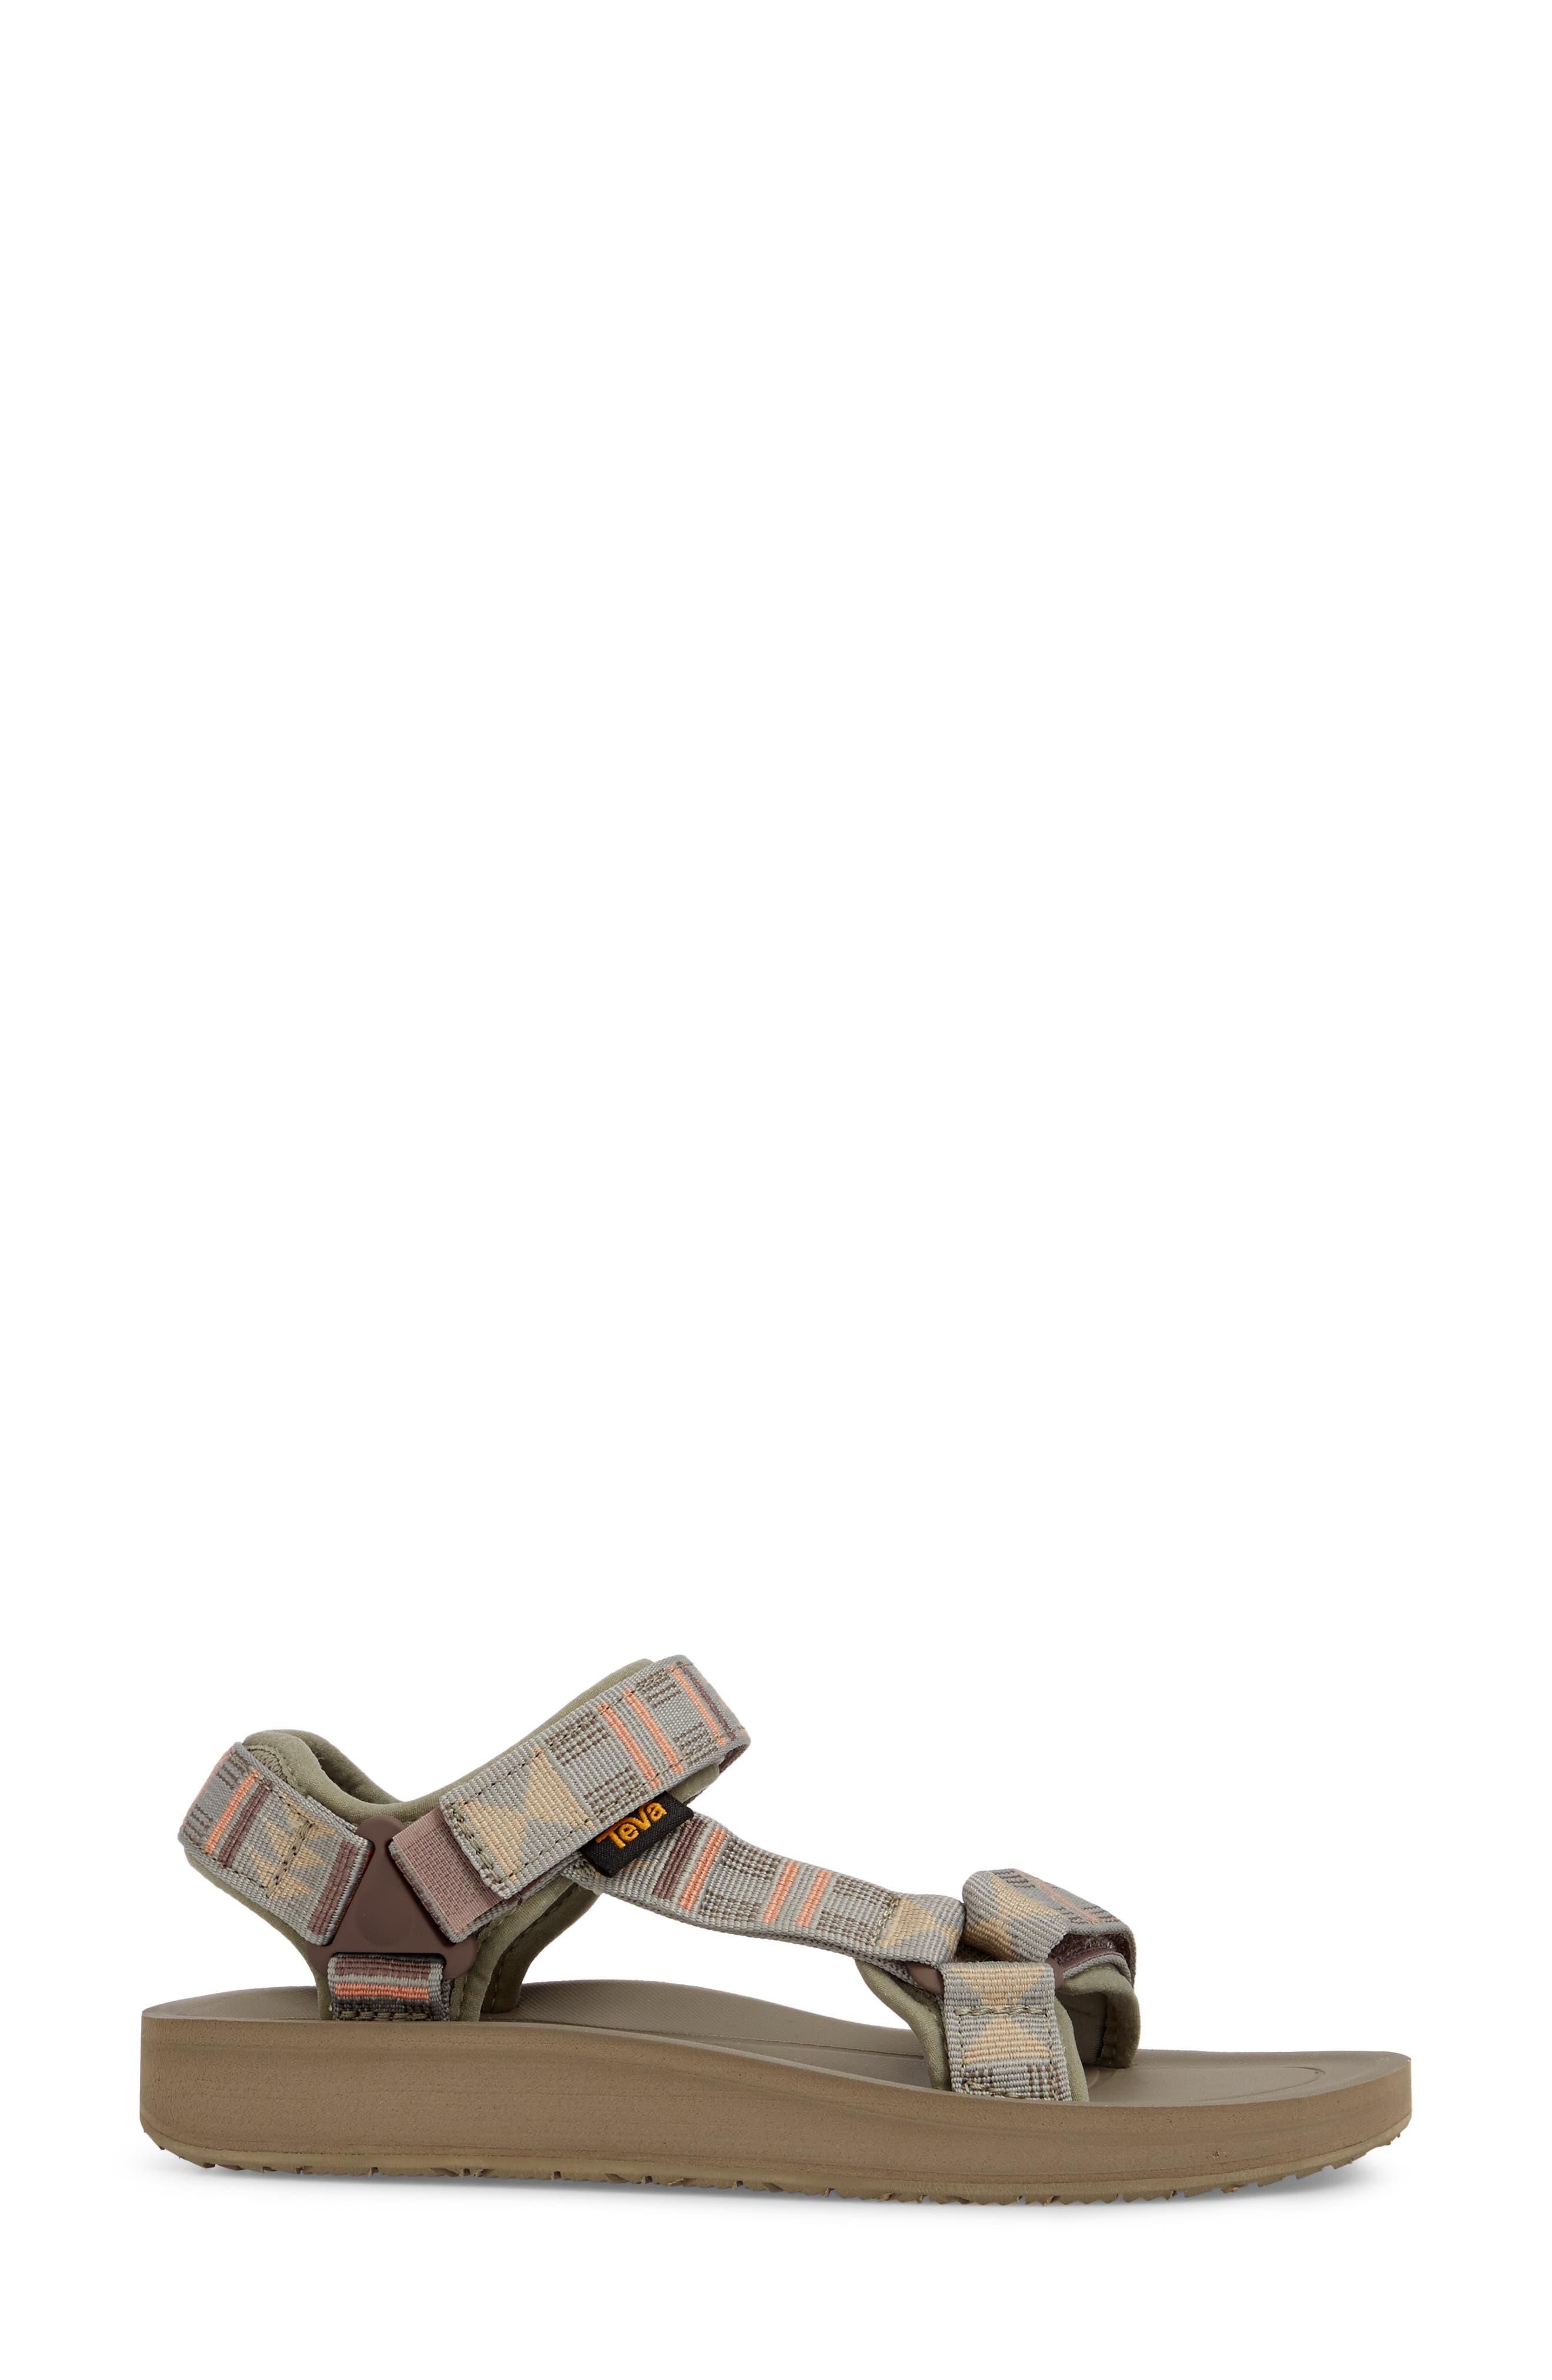 TEVA, Original Universal Premier Sandal, Alternate thumbnail 3, color, 250